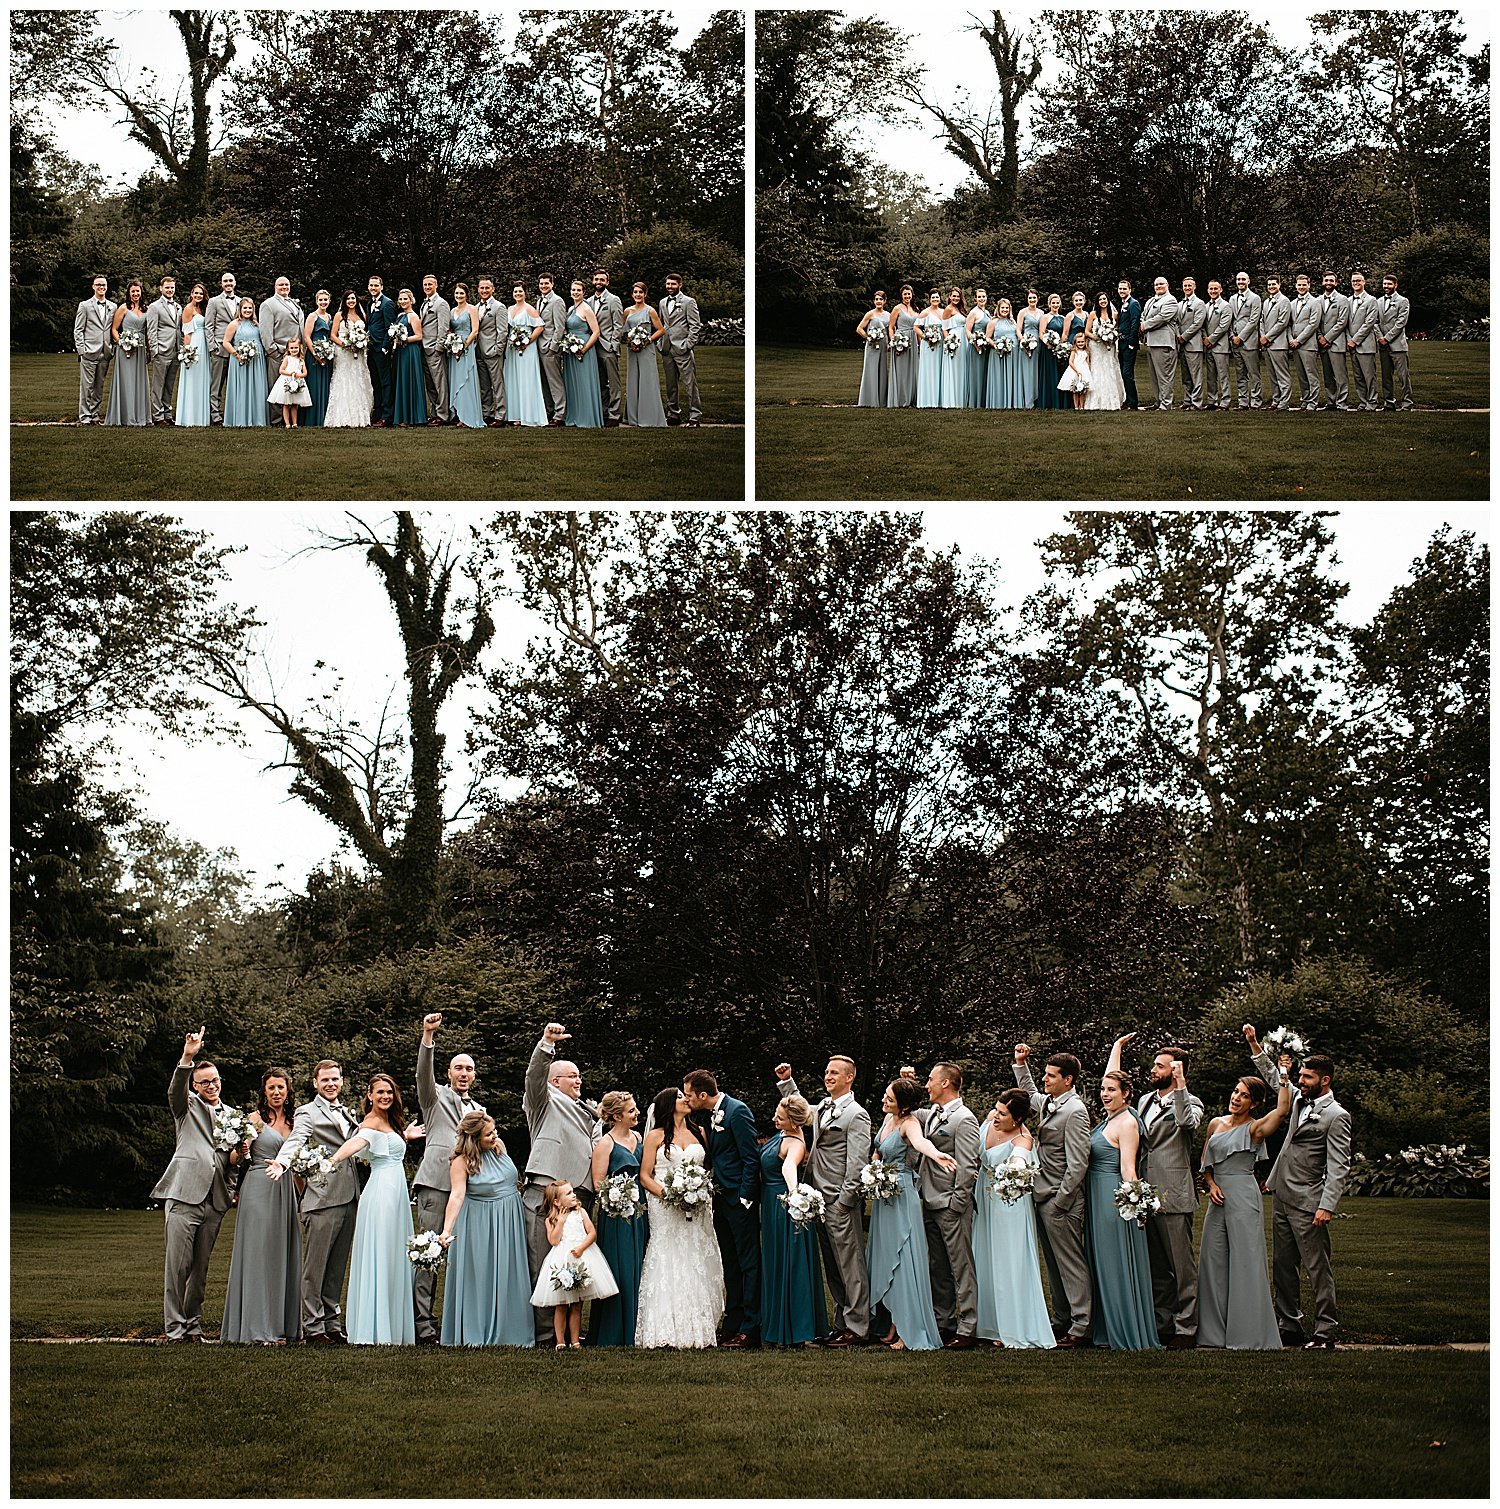 NEPA-Bloomsburg-Wedding-Photographer-at-The-Barn-at-Boones-Dam-Bloomsburg-PA_0031.jpg